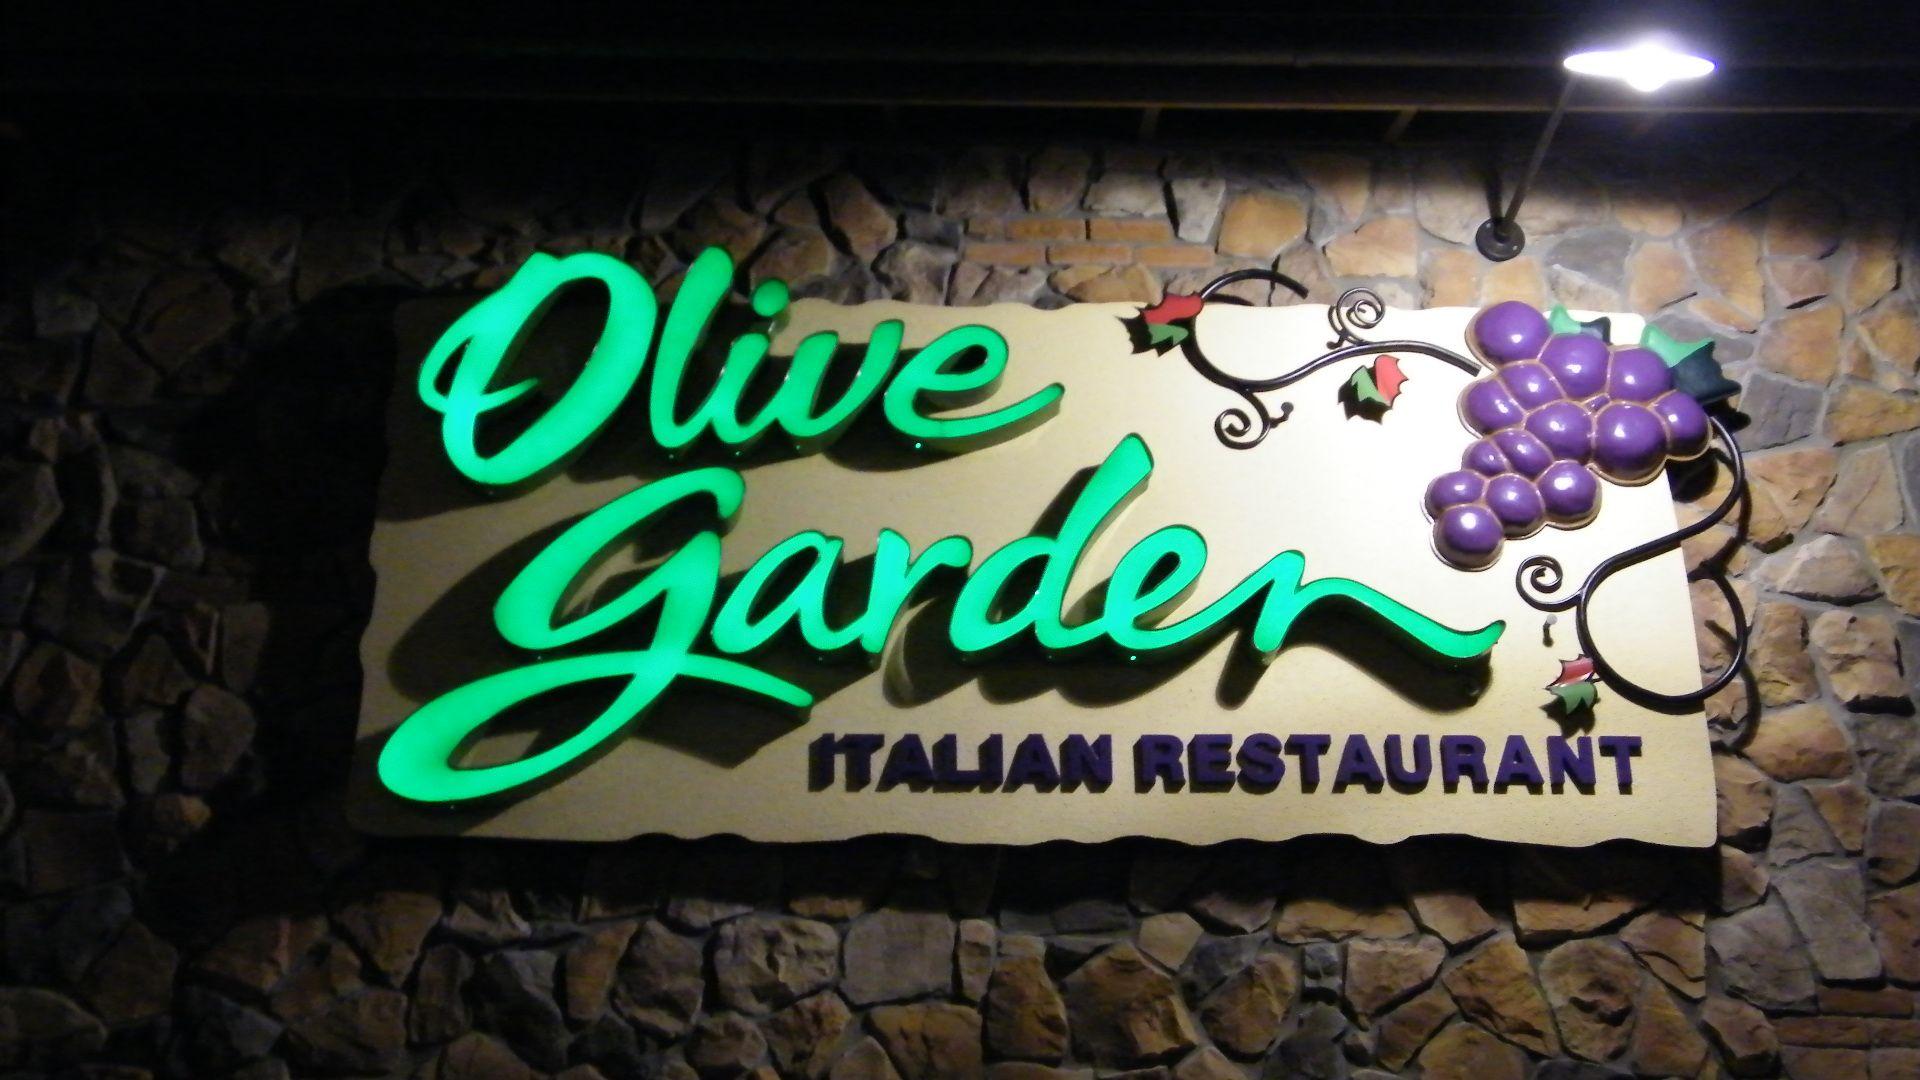 Favorite. Olive garden italian restaurant, Italian